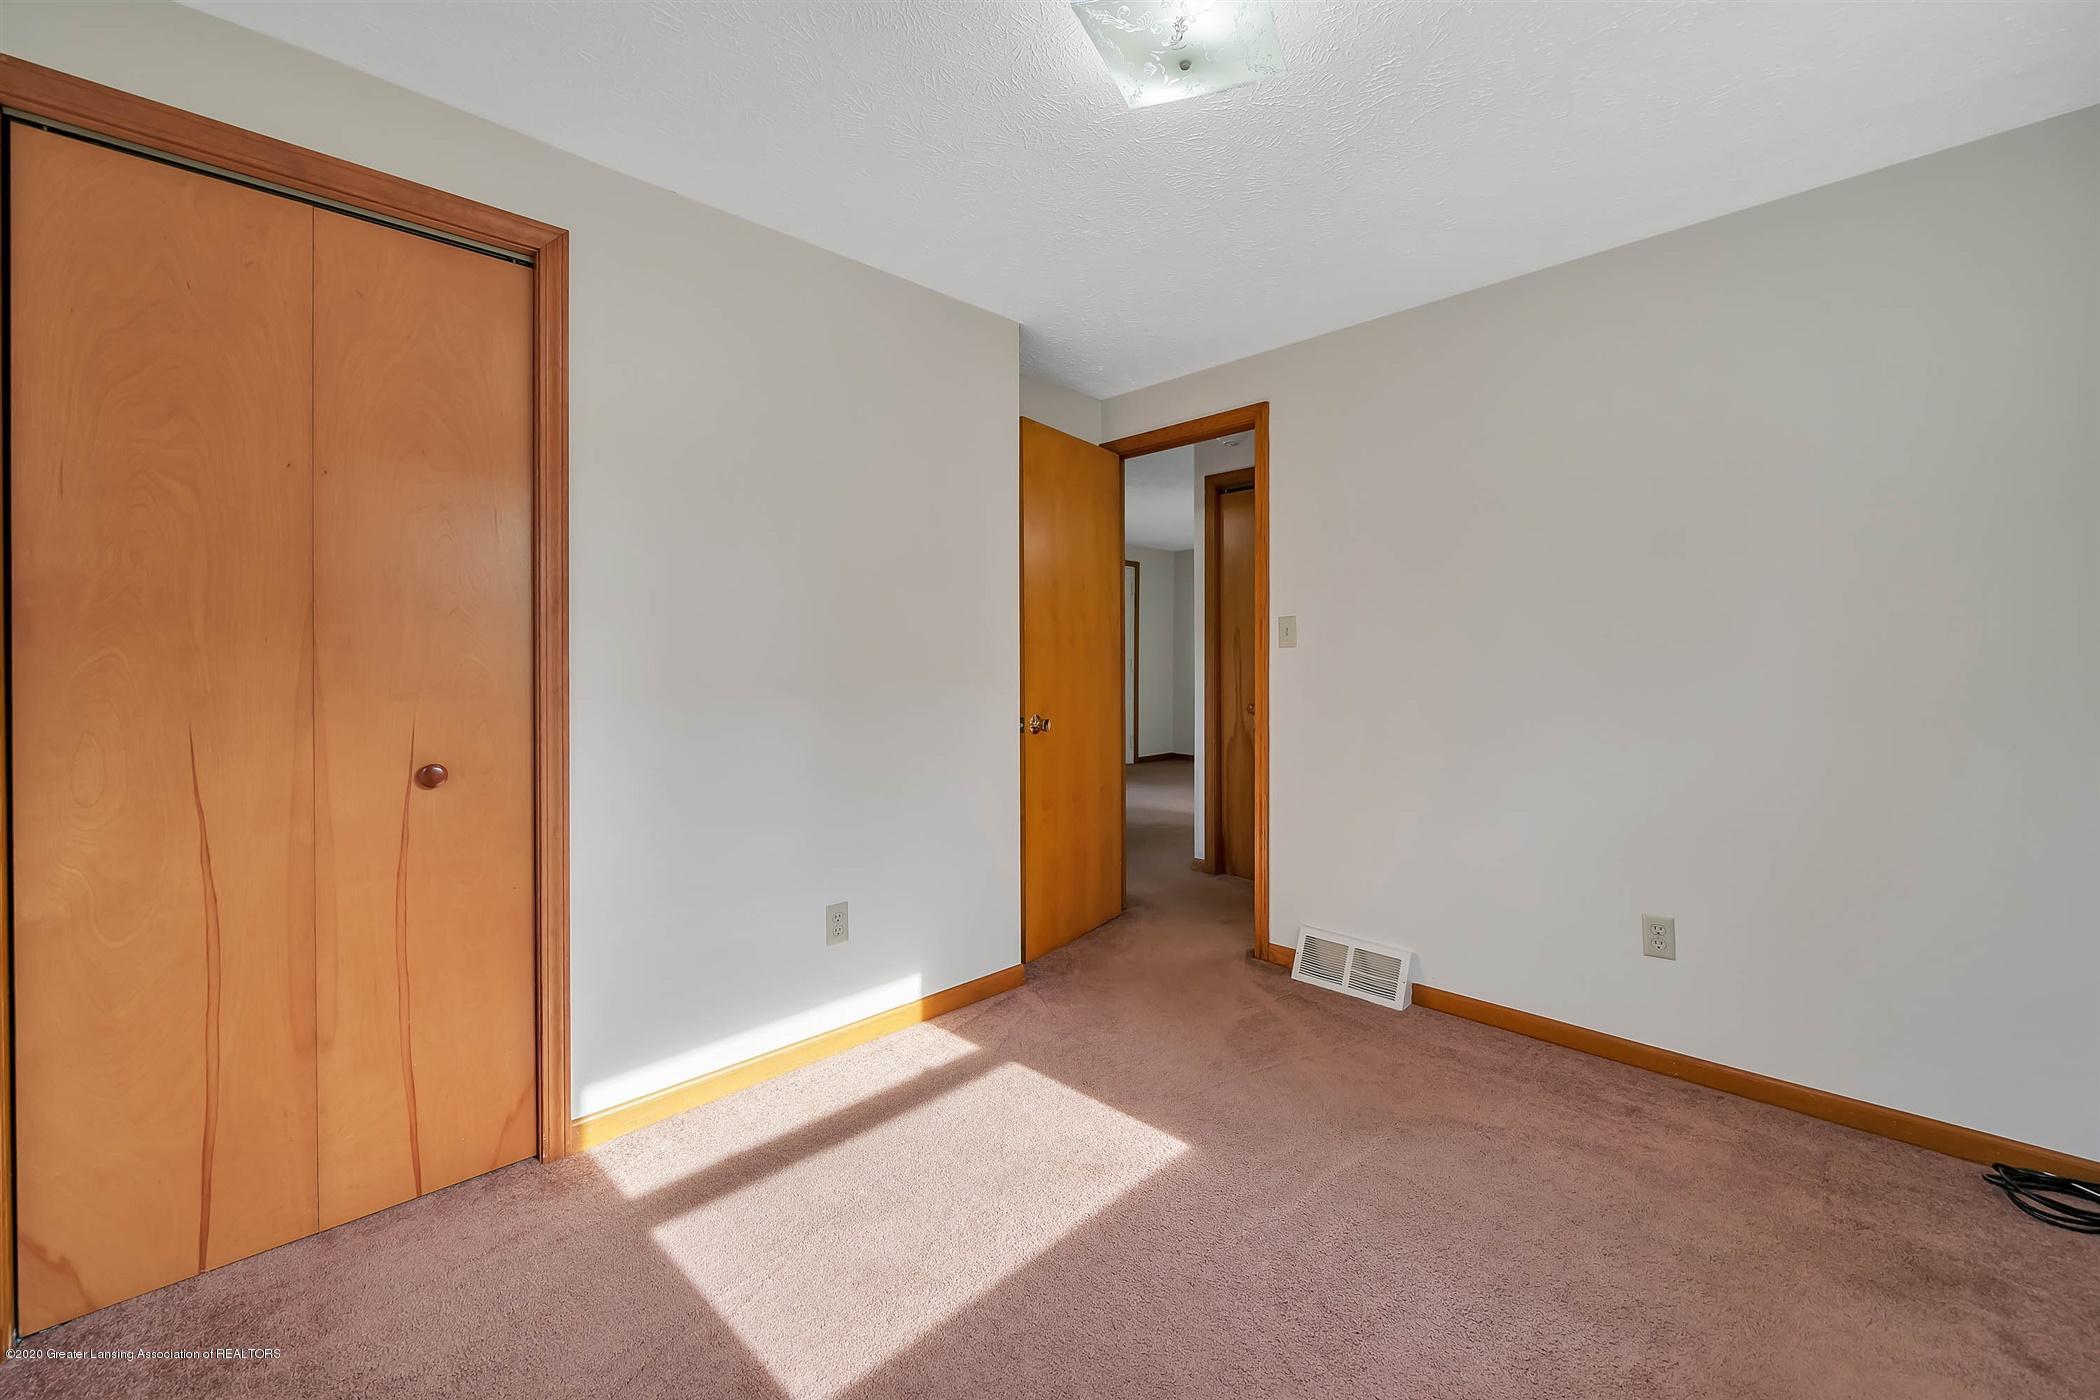 6750 W Lovejoy Rd - (27) 6756 Lovejoy Bedroom 1 - 27